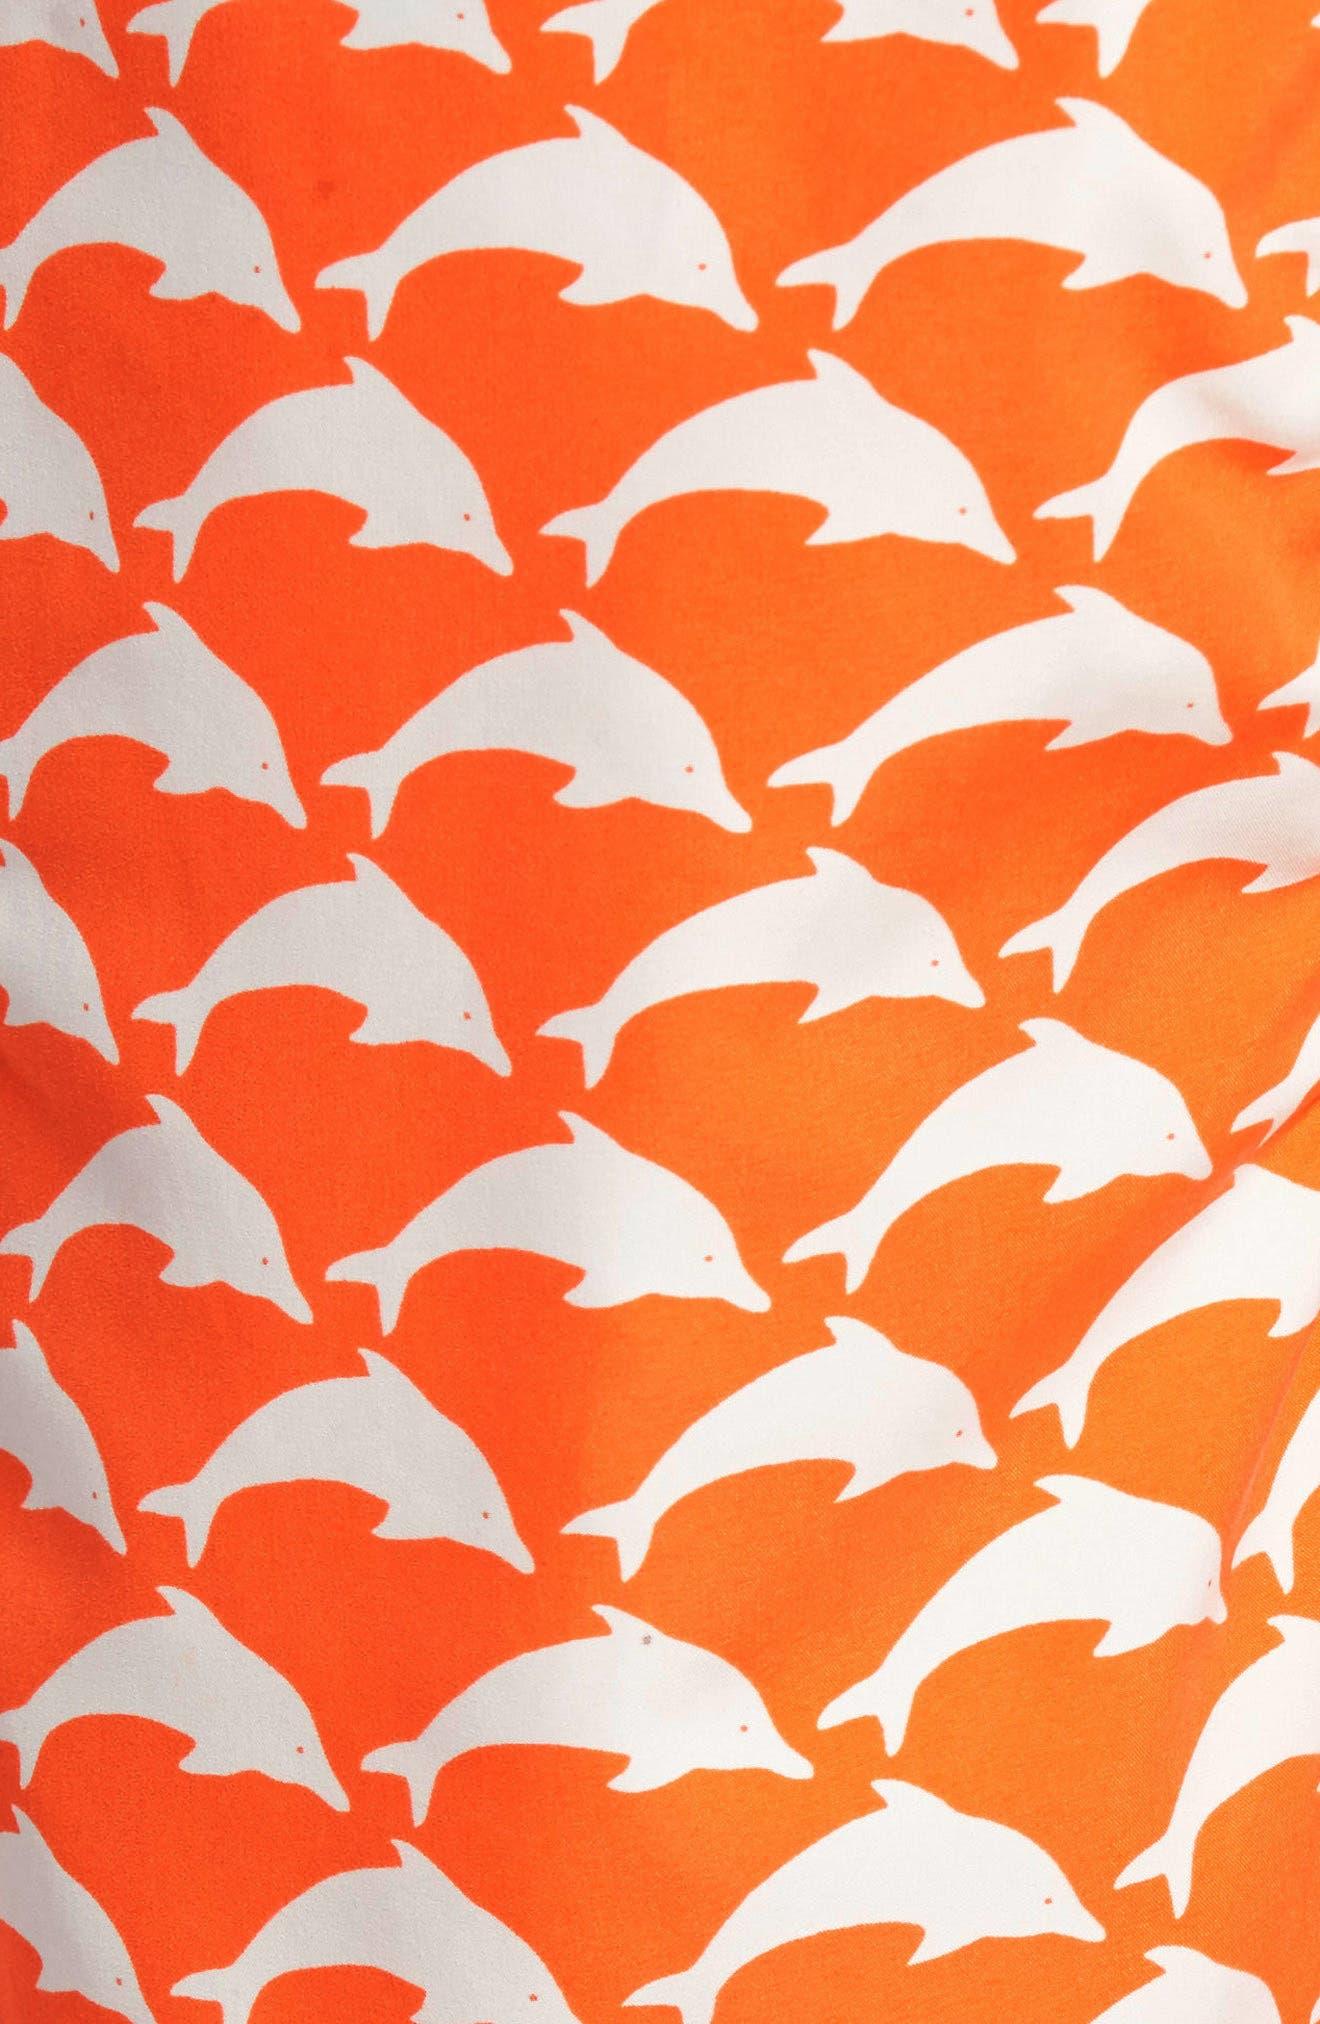 Dolphin Print Swim Trunks,                             Alternate thumbnail 5, color,                             820